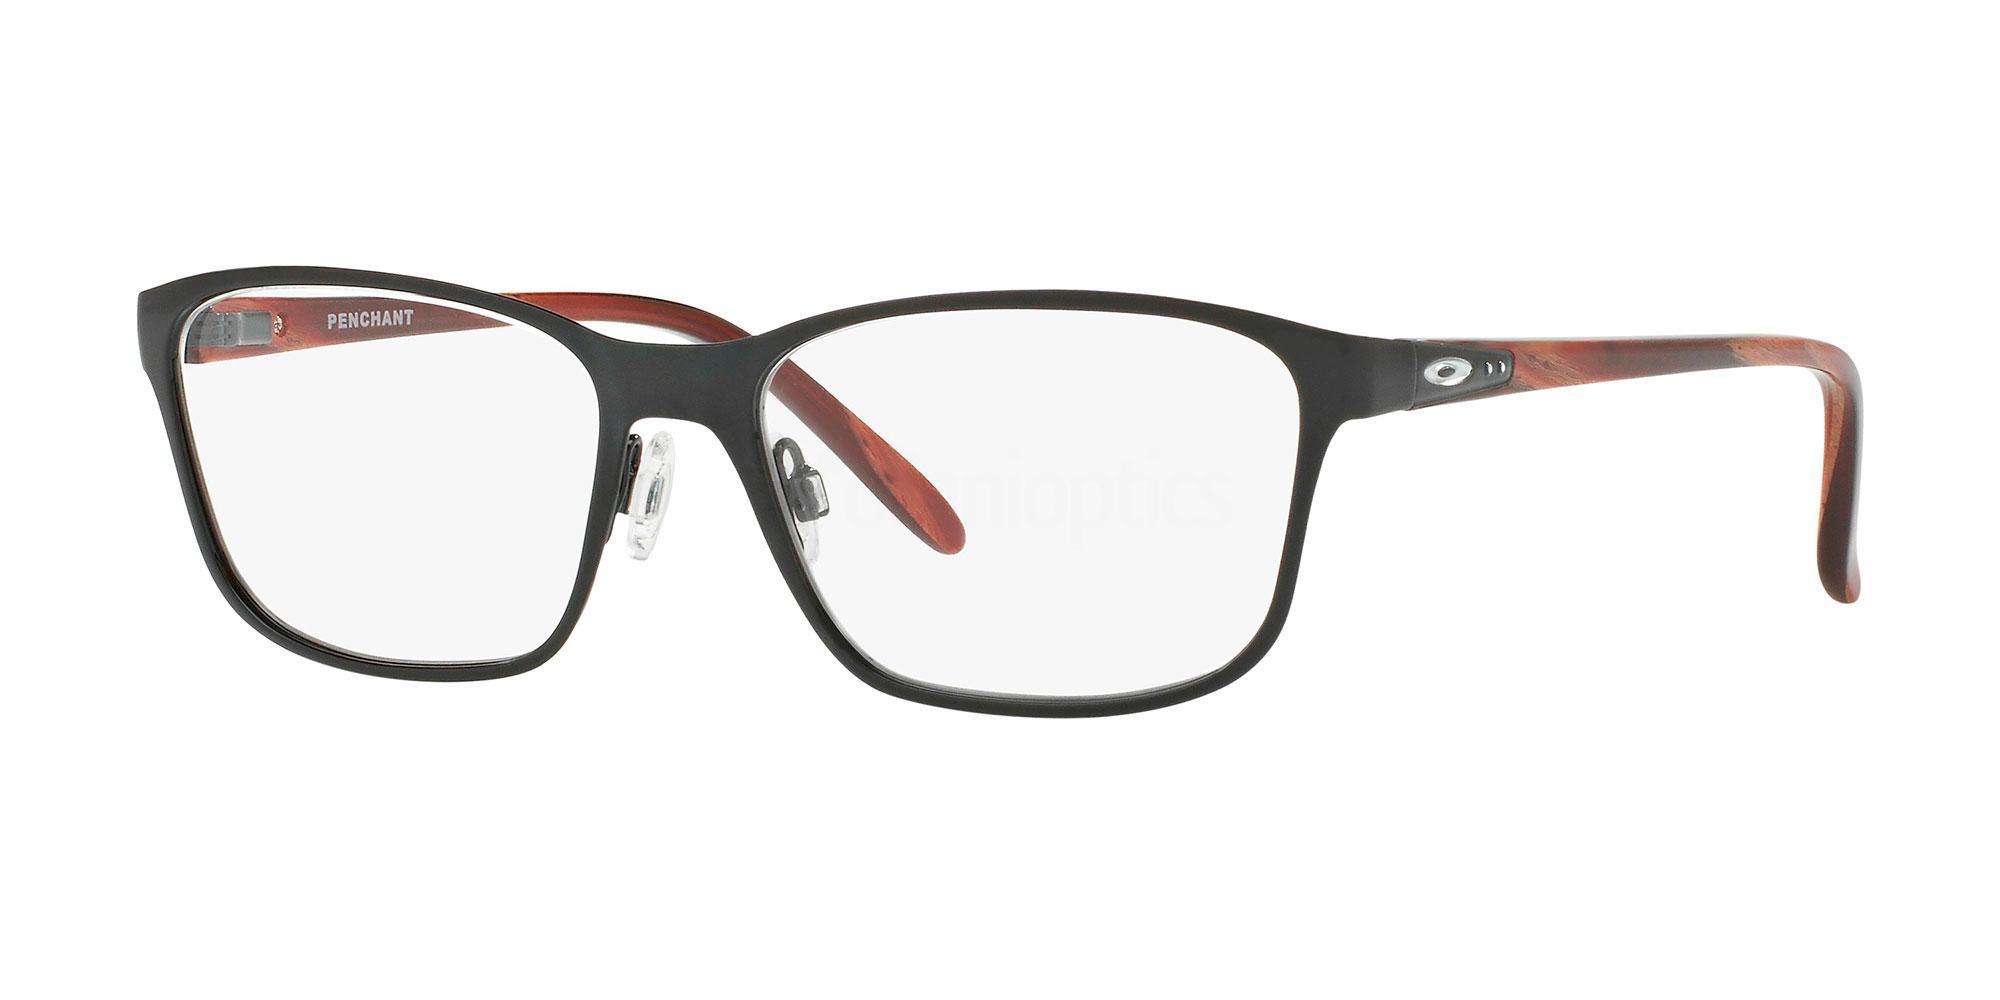 321401 OX3214 PENCHANT Glasses, Oakley Ladies